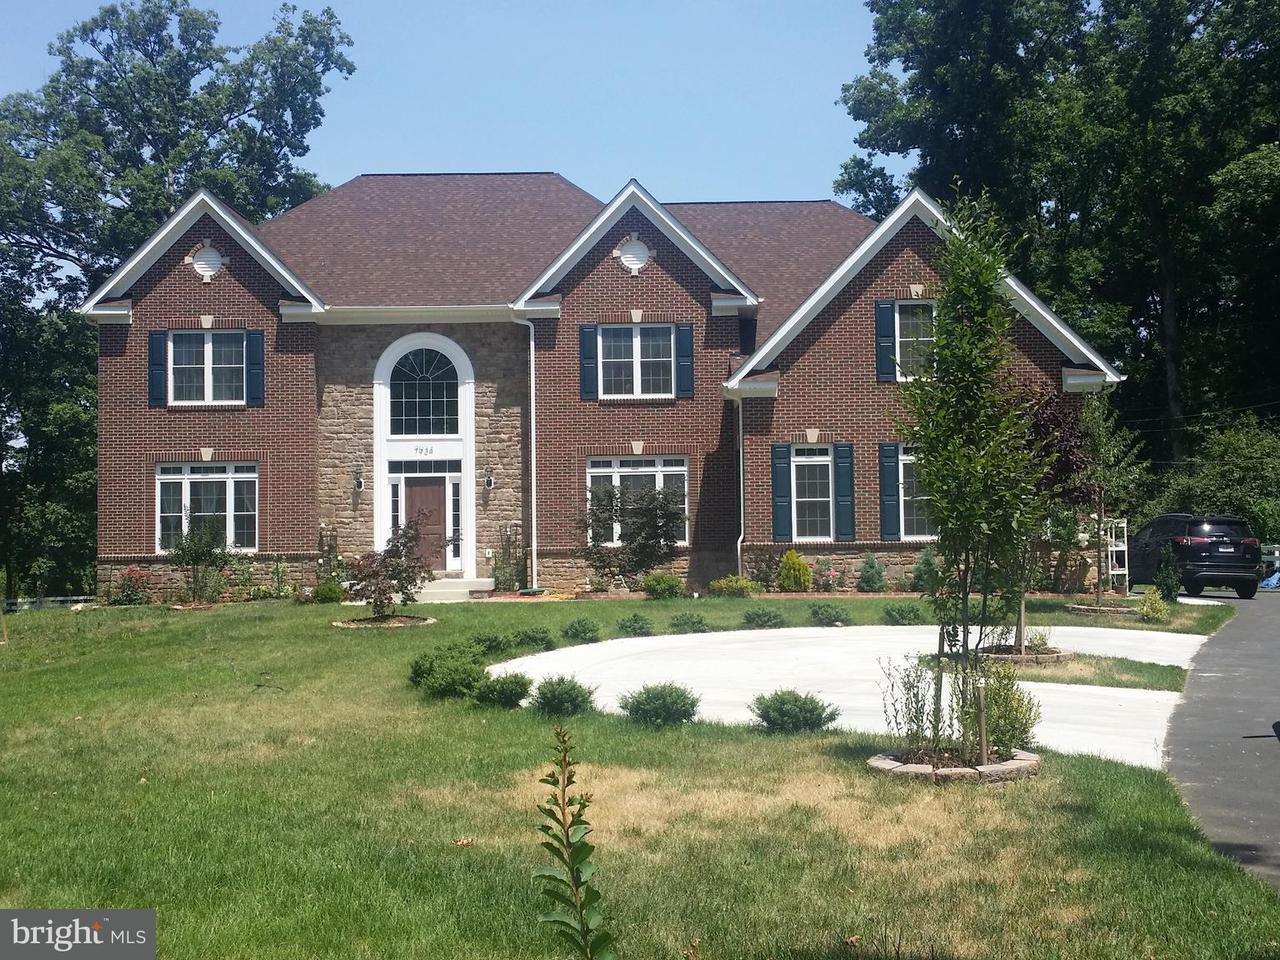 Single Family Home for Sale at 7934 SHREVE Road 7934 SHREVE Road Falls Church, Virginia 22043 United States